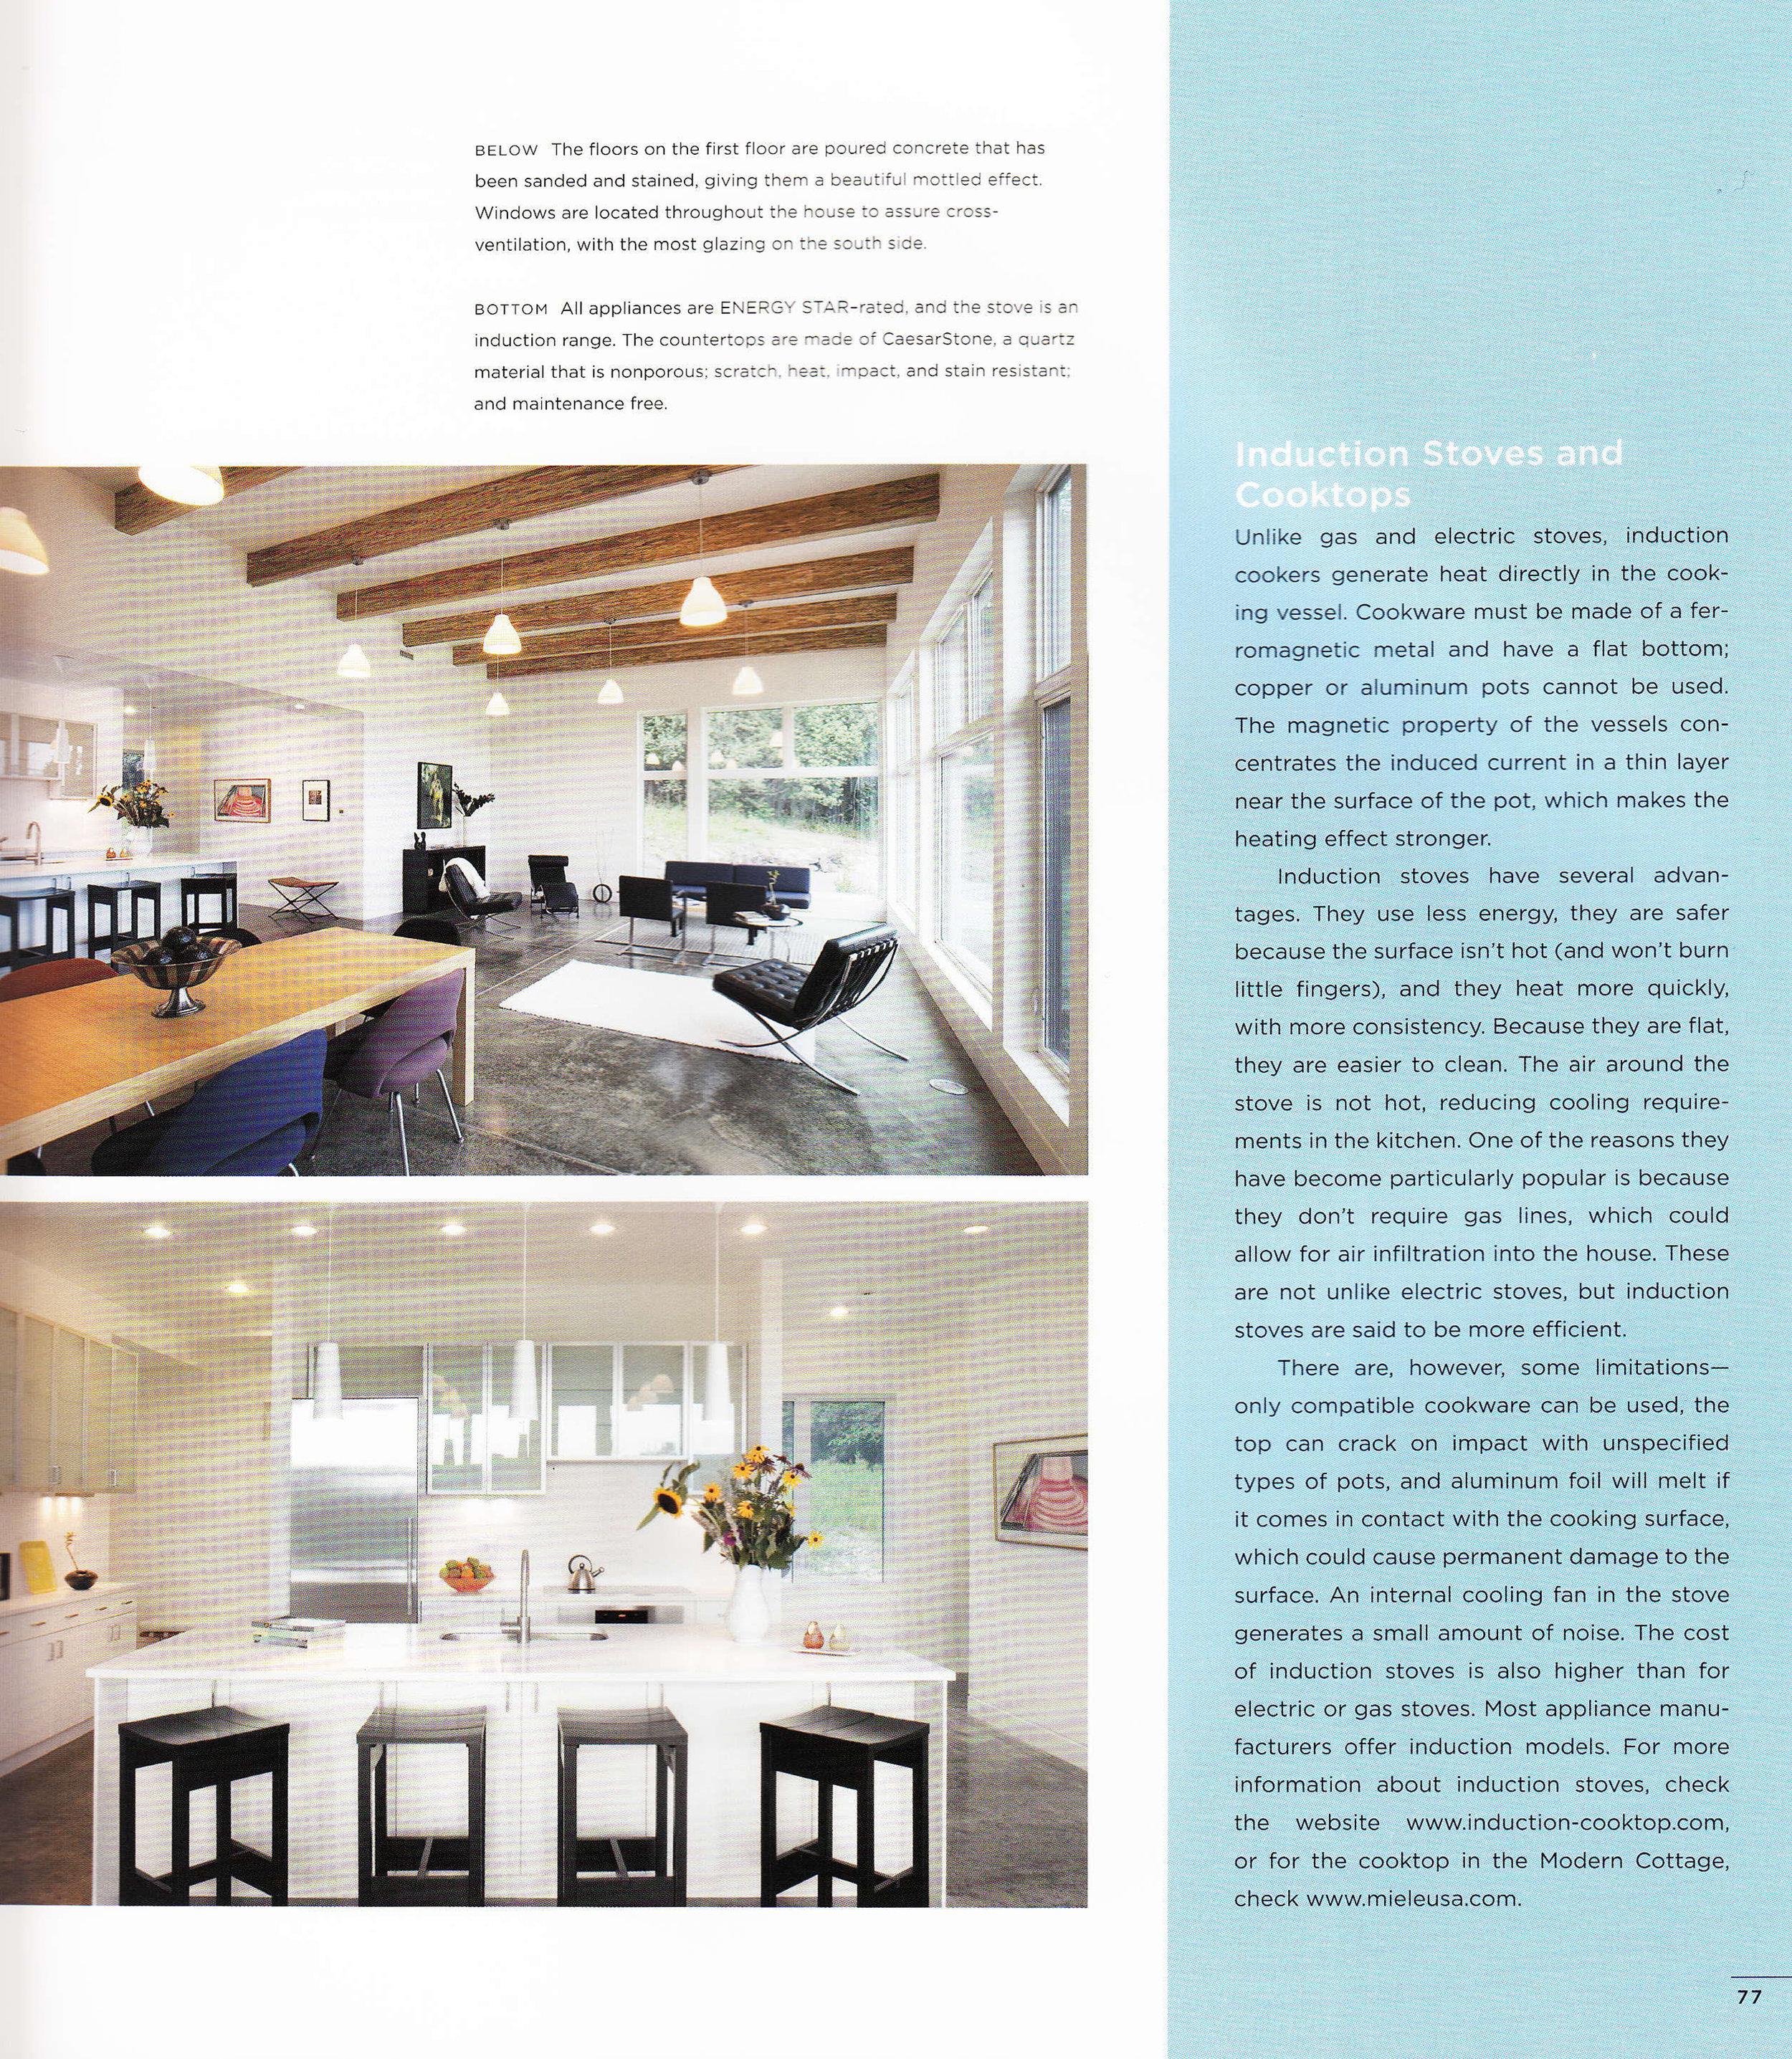 turkel_design_prefab_press_Modern_Cottage_Prefabuolus.5.jpg